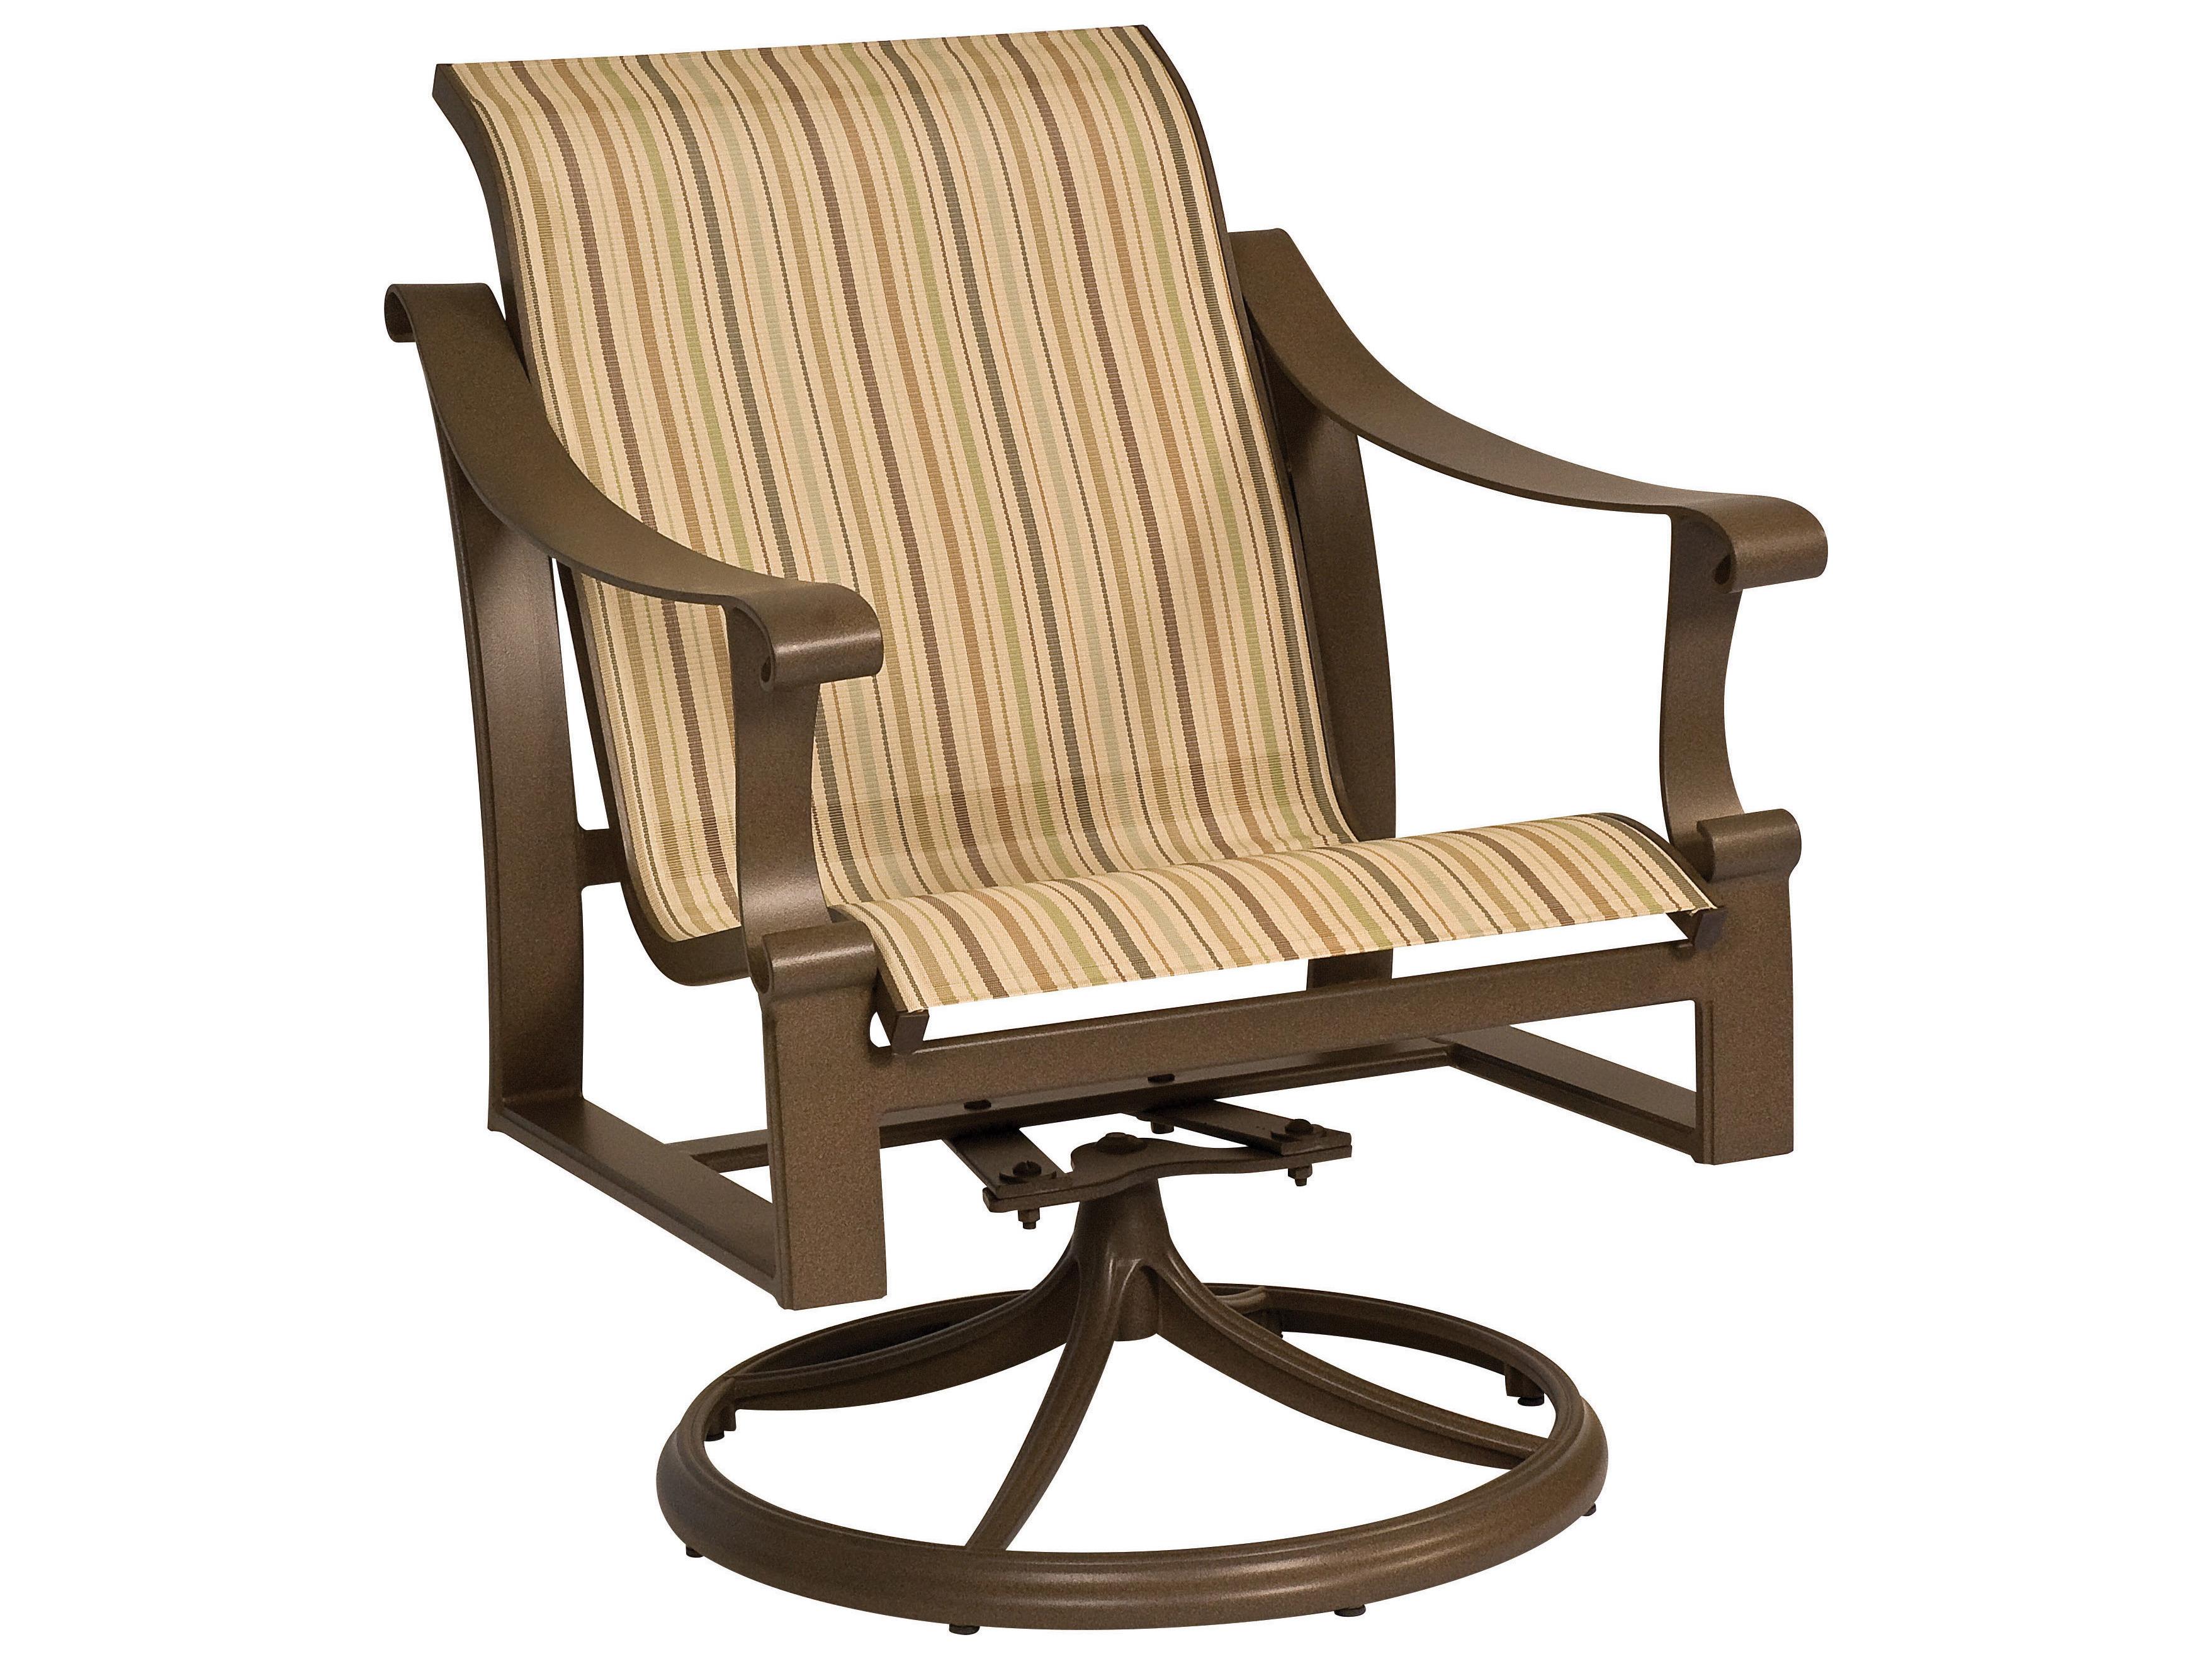 low back chairs camping home depot hampton bay chair covers woodard bungalow sling aluminum swivel rocker